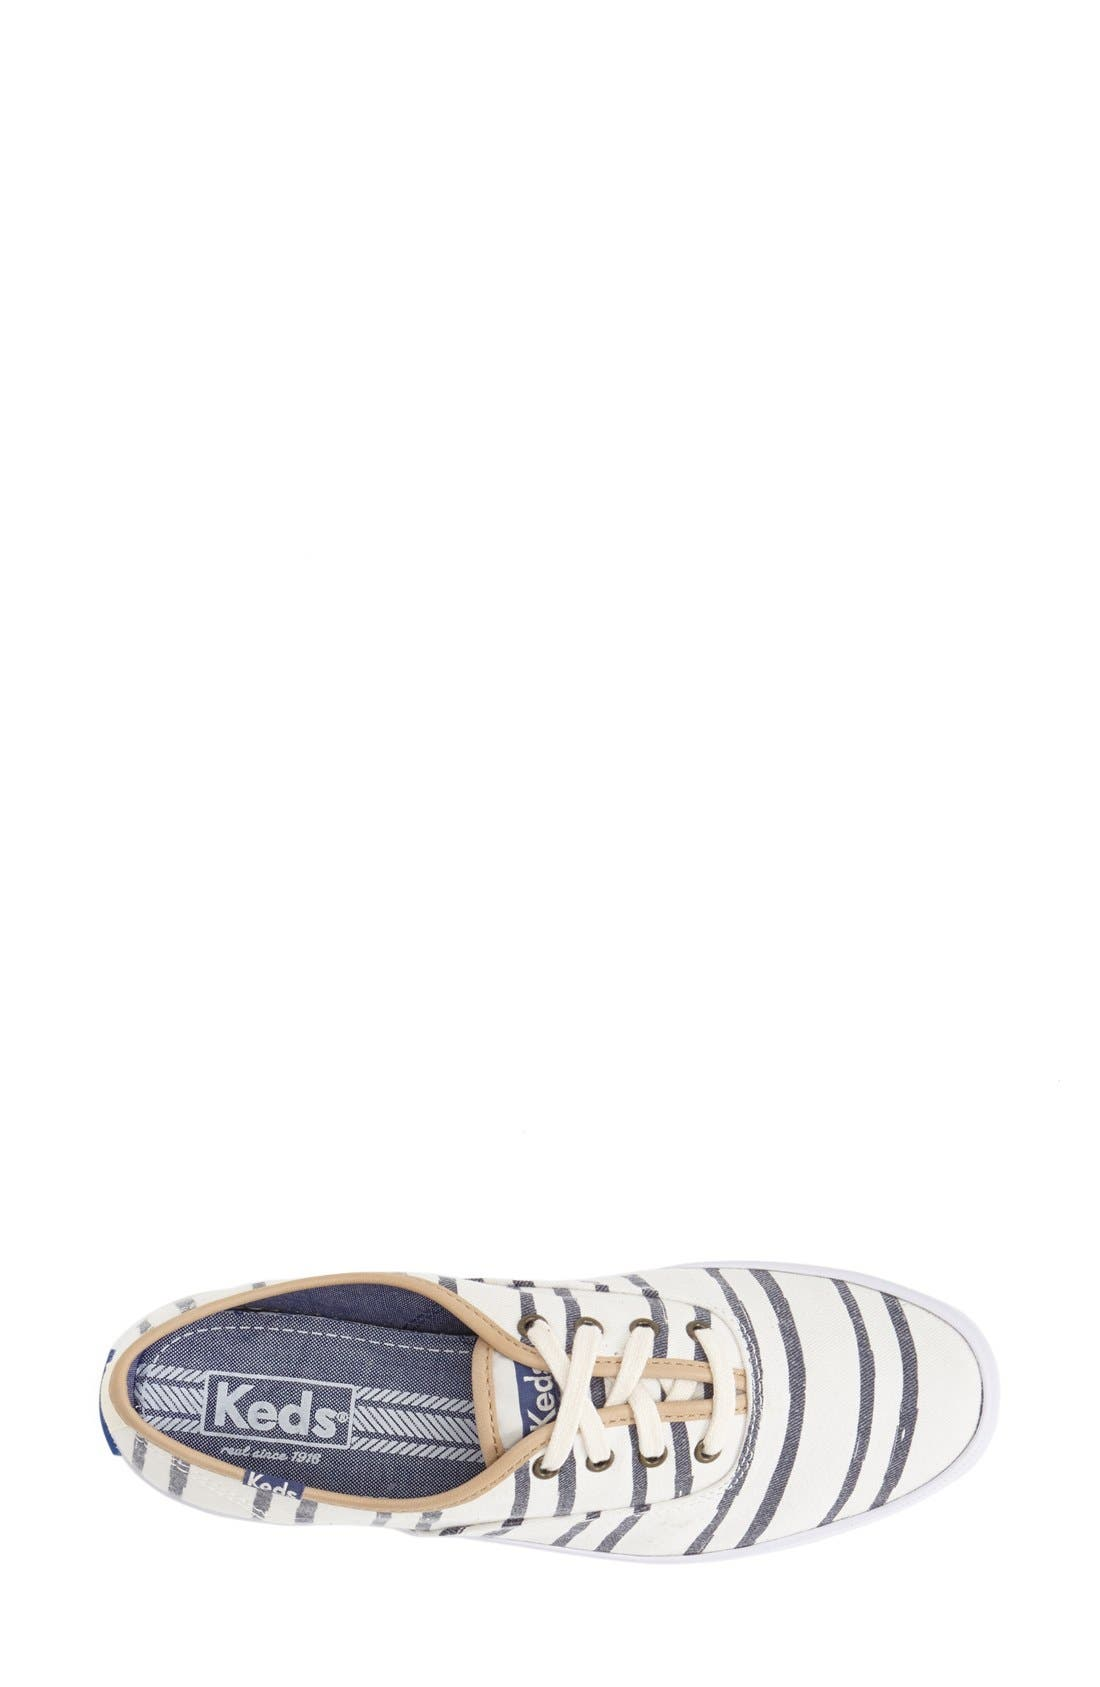 Alternate Image 3  - Keds® 'Champion - Washed Beach Stripe' Sneaker (Women)